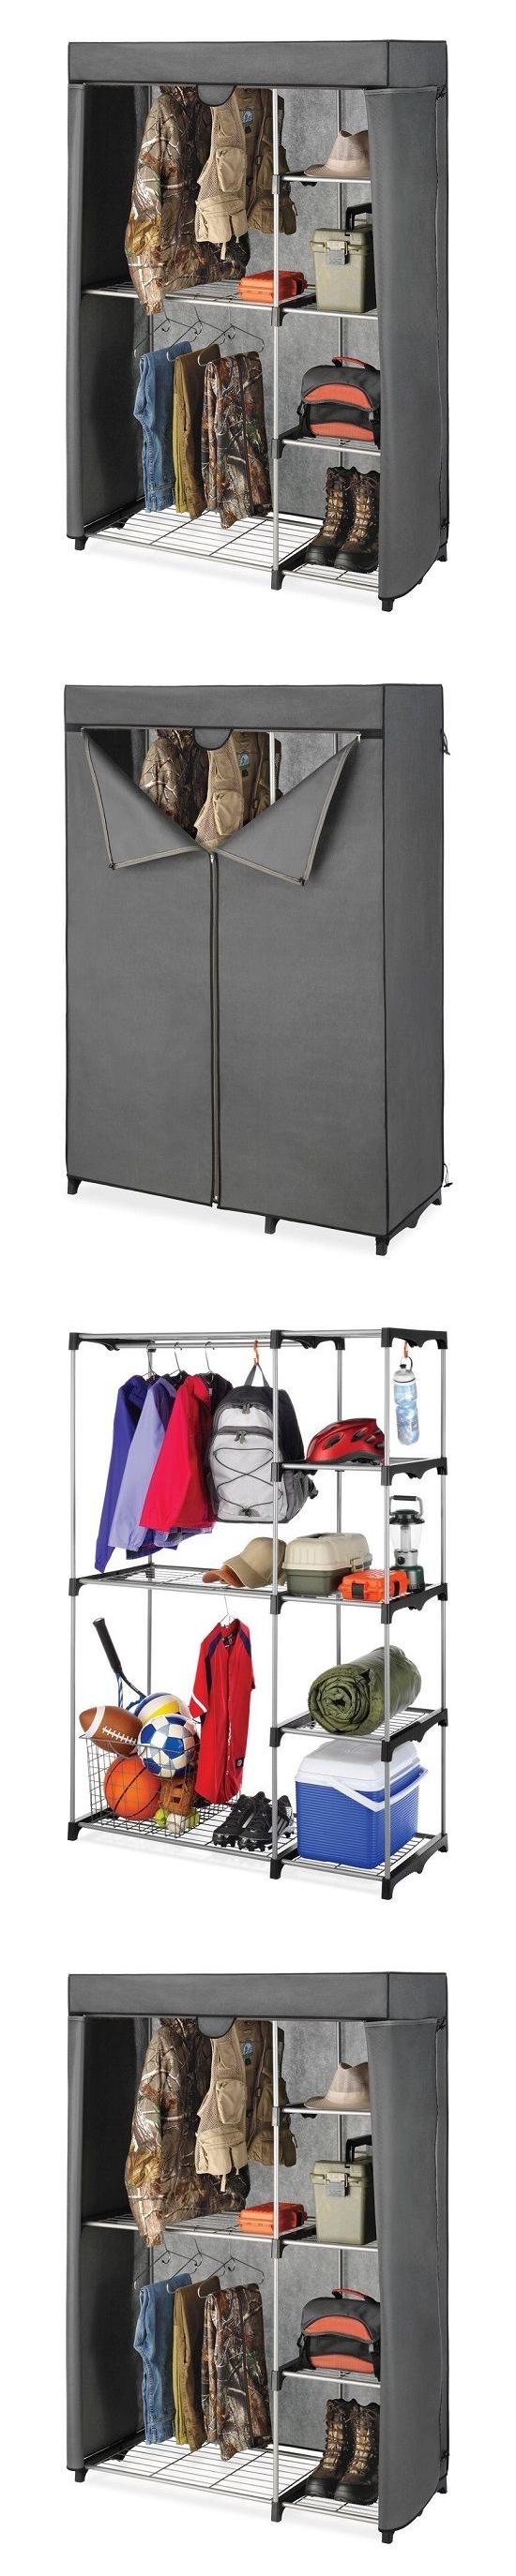 Closet organizers portable closet wardrobe utility organizer